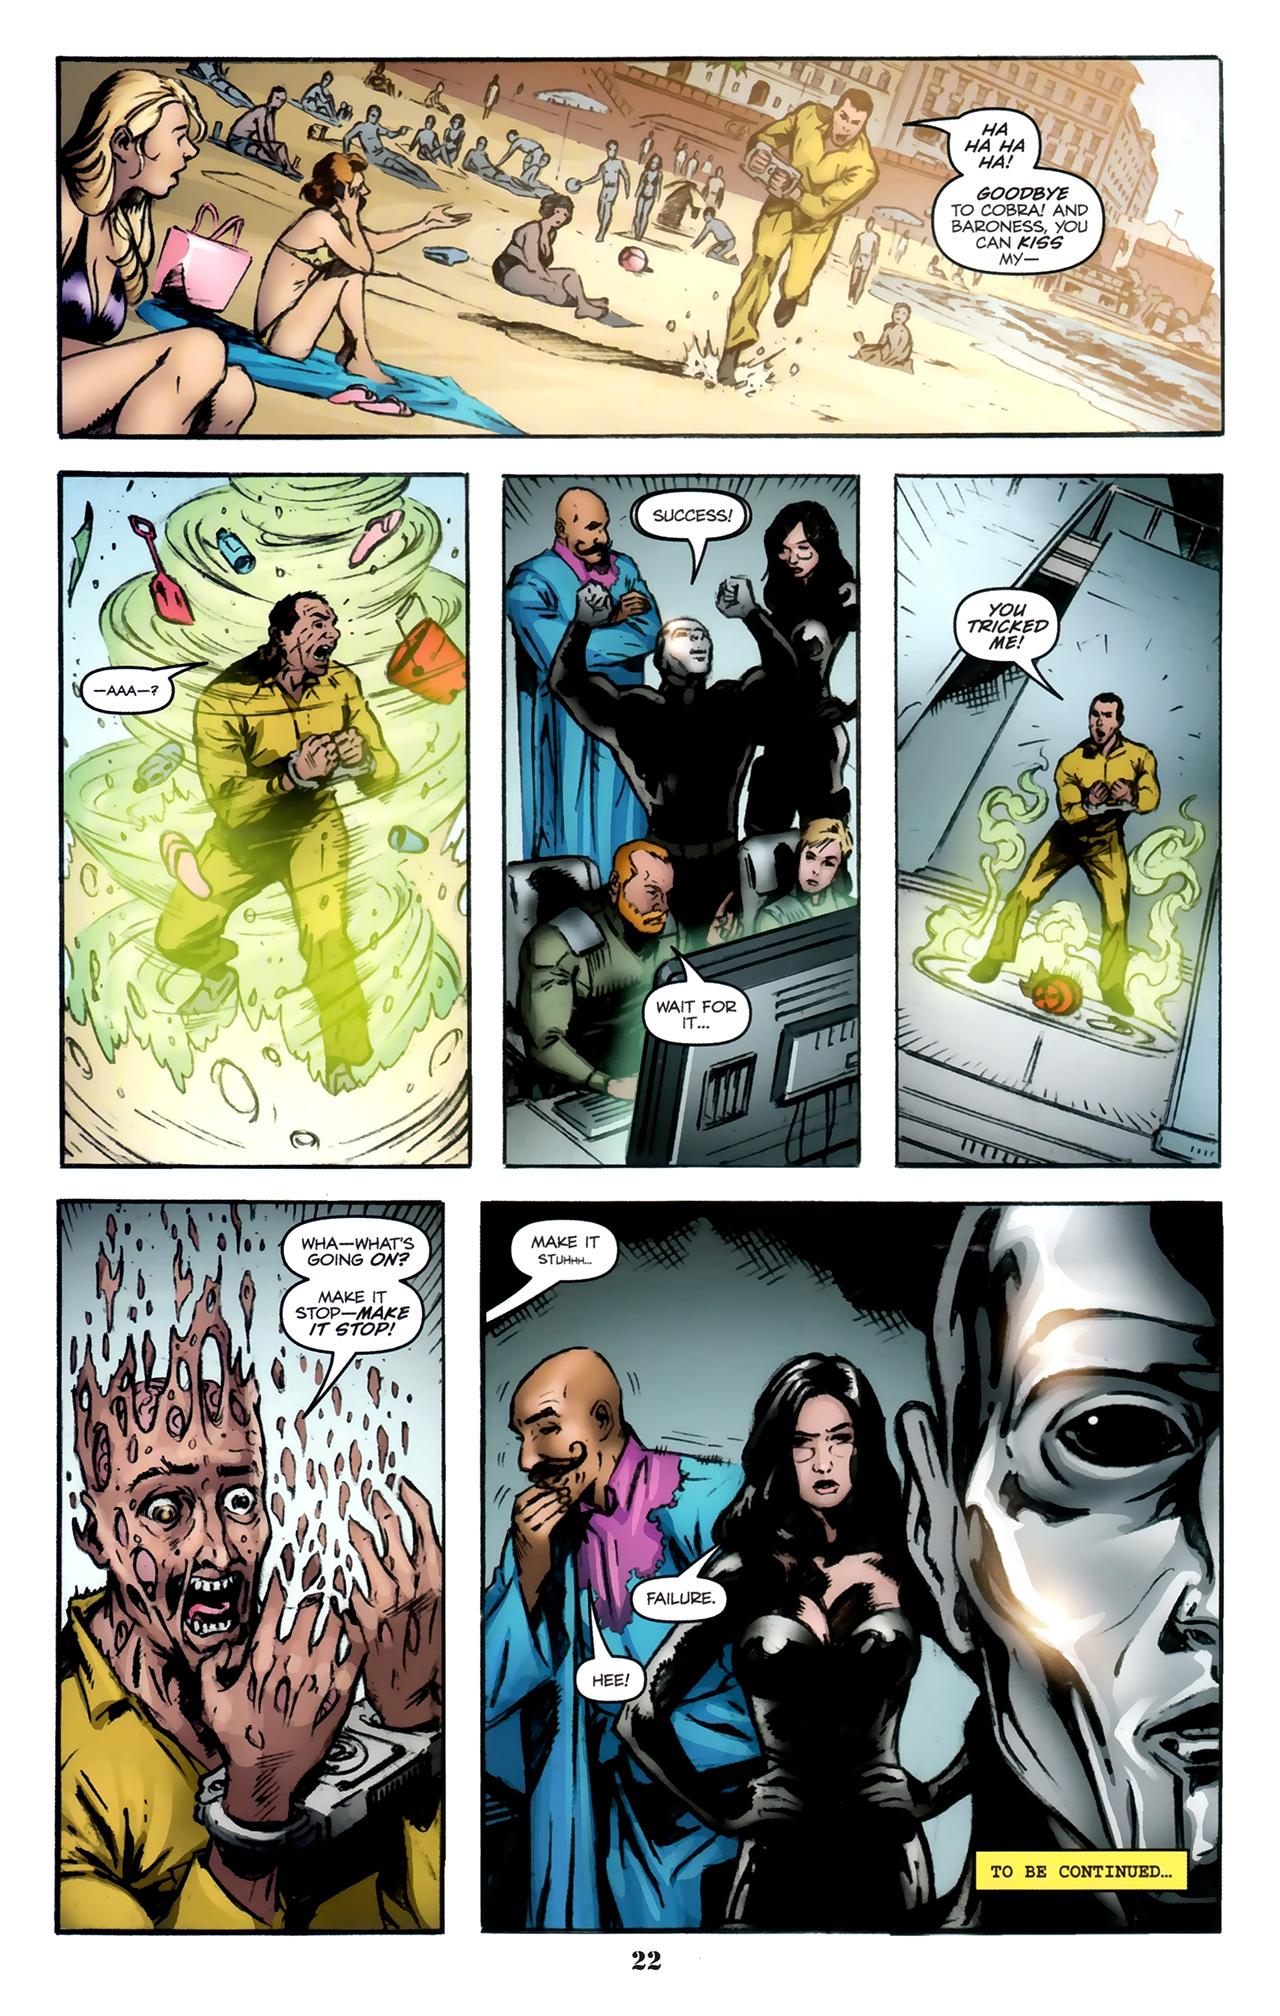 G I Joe 2008 Issue 11 Viewcomic Reading Comics Online For